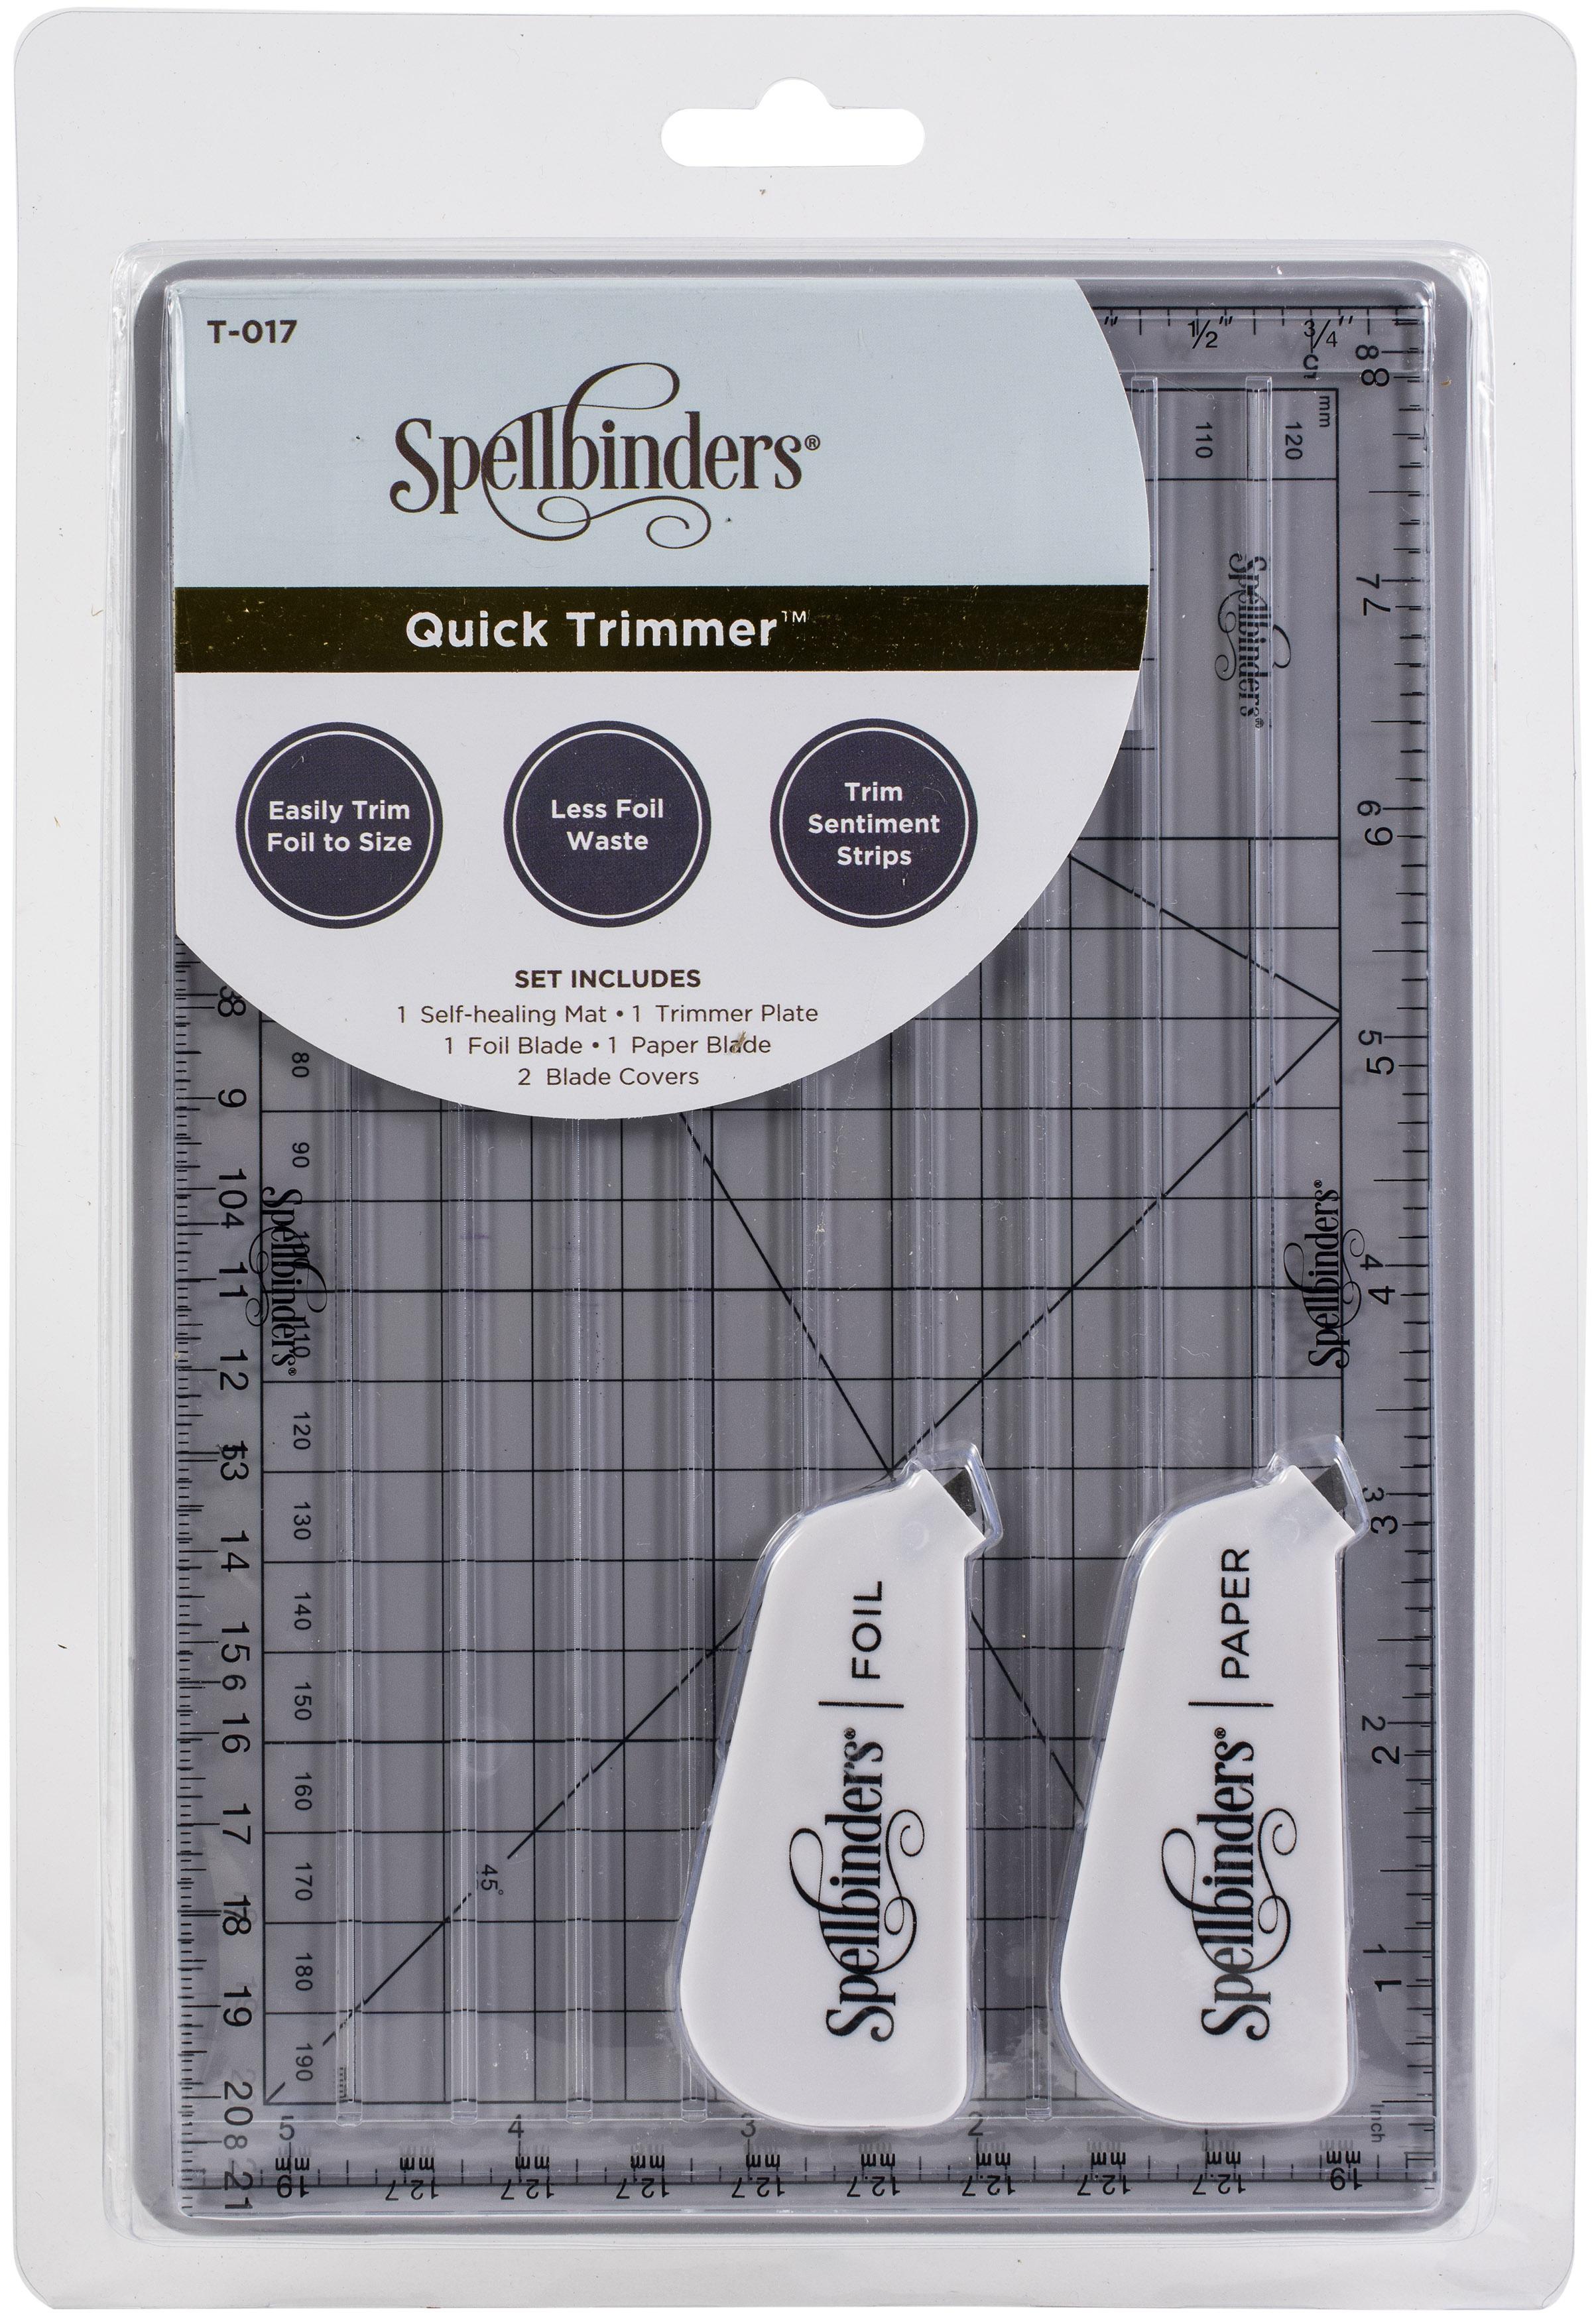 Spellbinders Quick Trimmer Tool-